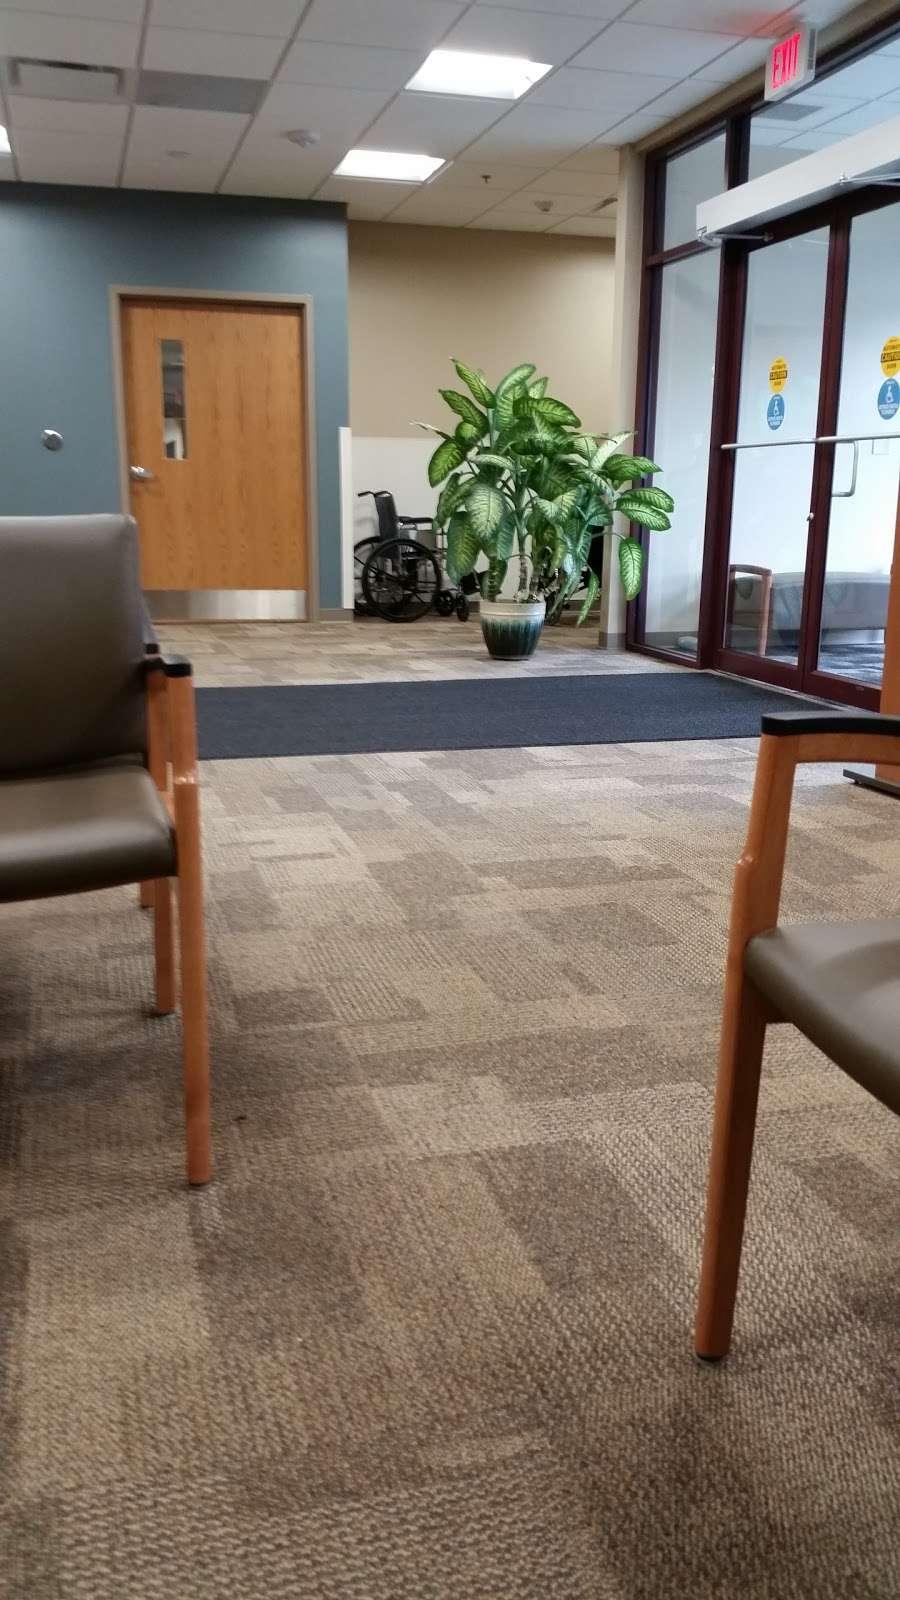 Aurora Sports Medicine Rehab Clinic - doctor  | Photo 1 of 2 | Address: 700 Geneva Pkwy N, Lake Geneva, WI 53147, USA | Phone: (262) 249-3500